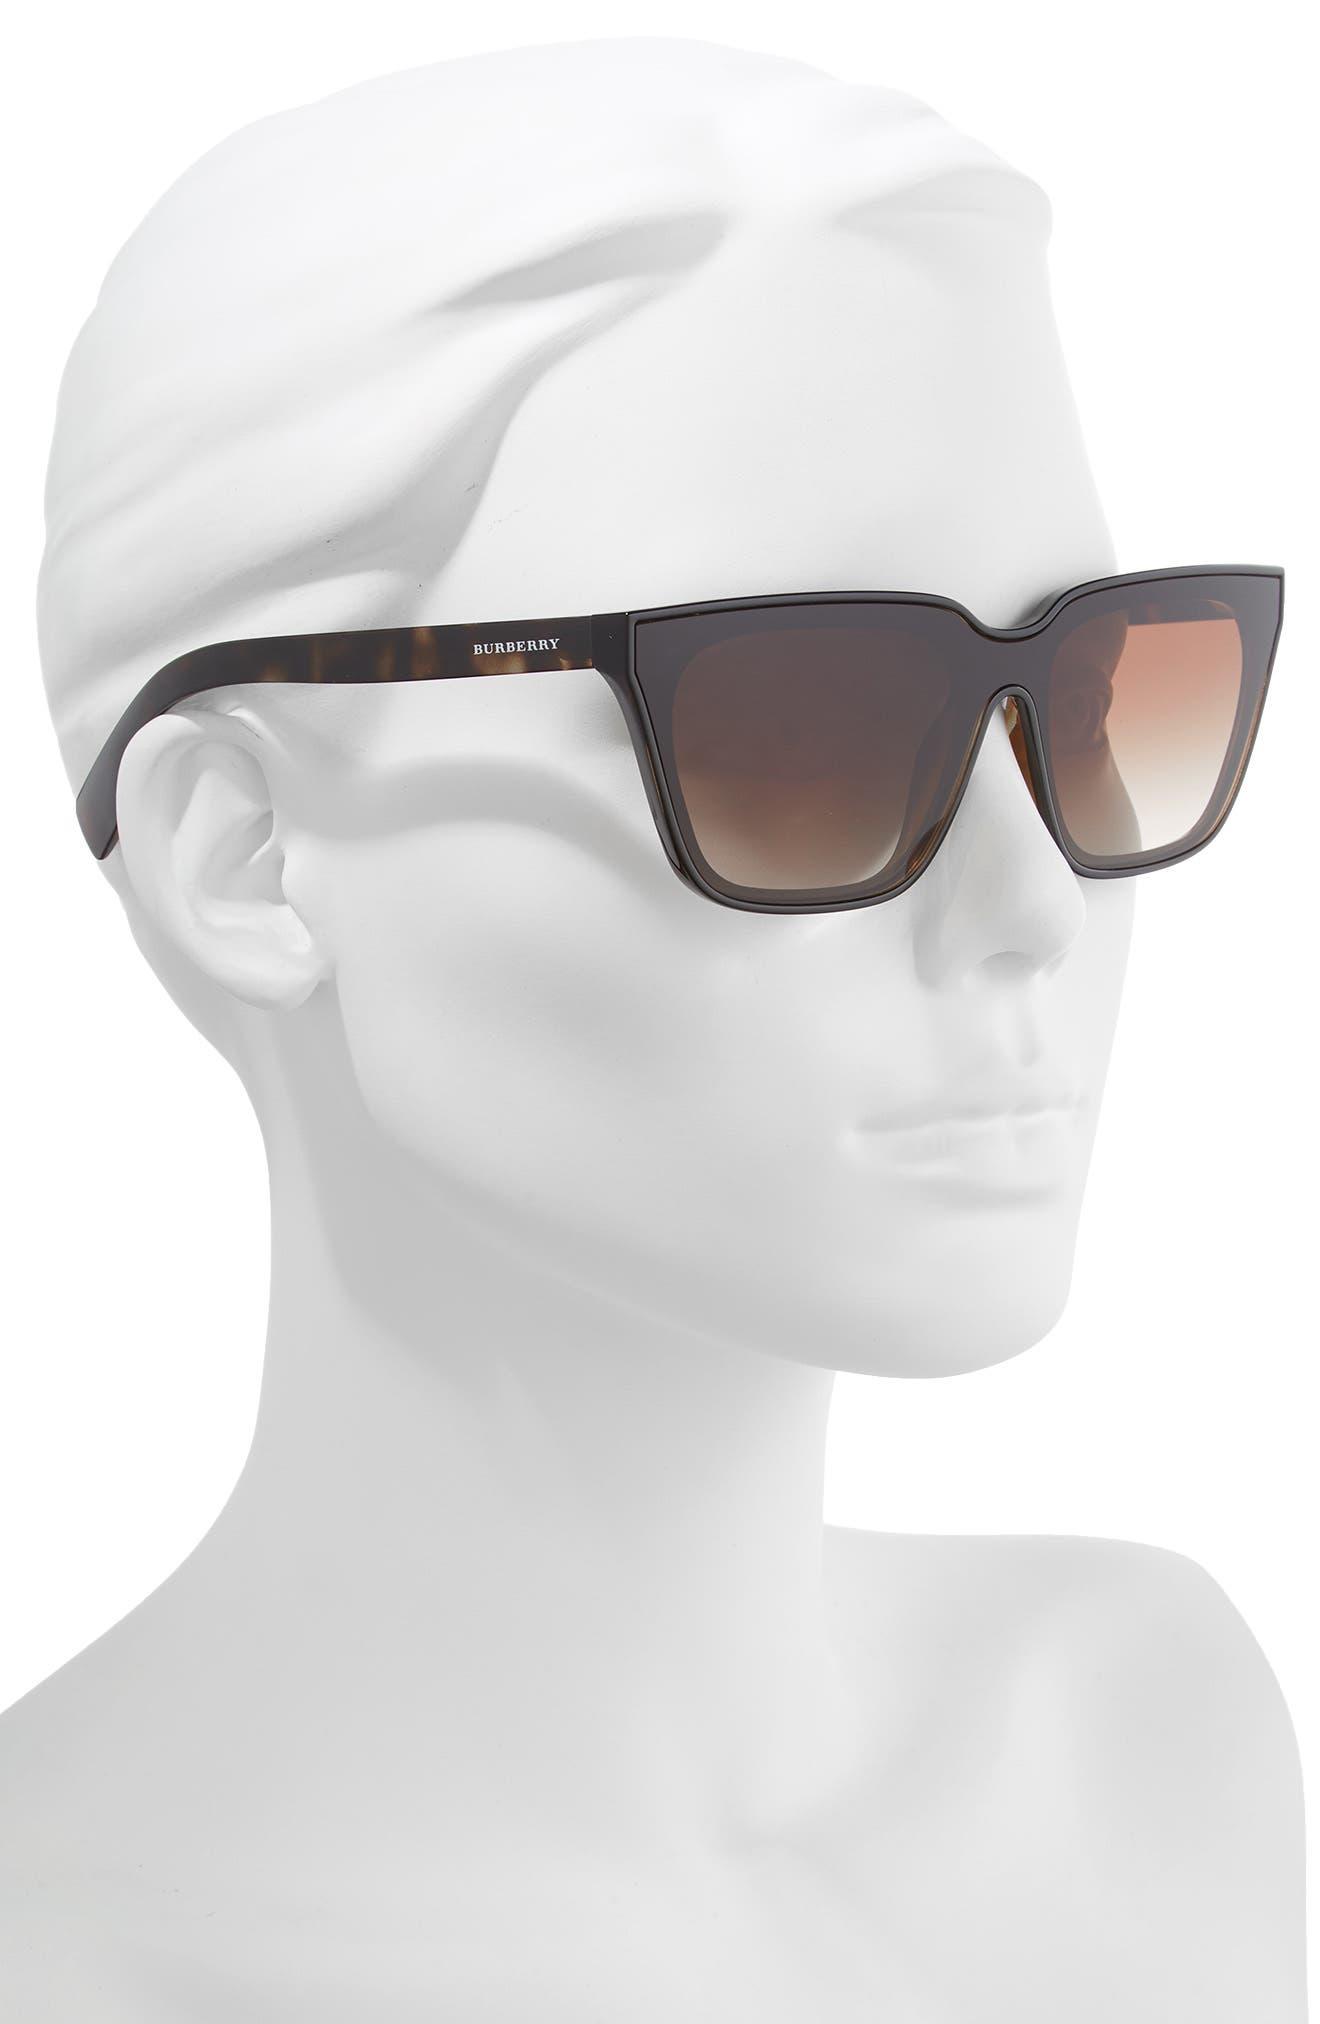 BURBERRY, 40mm Square Sunglasses, Alternate thumbnail 2, color, BLACK/ DARK HAVANA GRADIENT